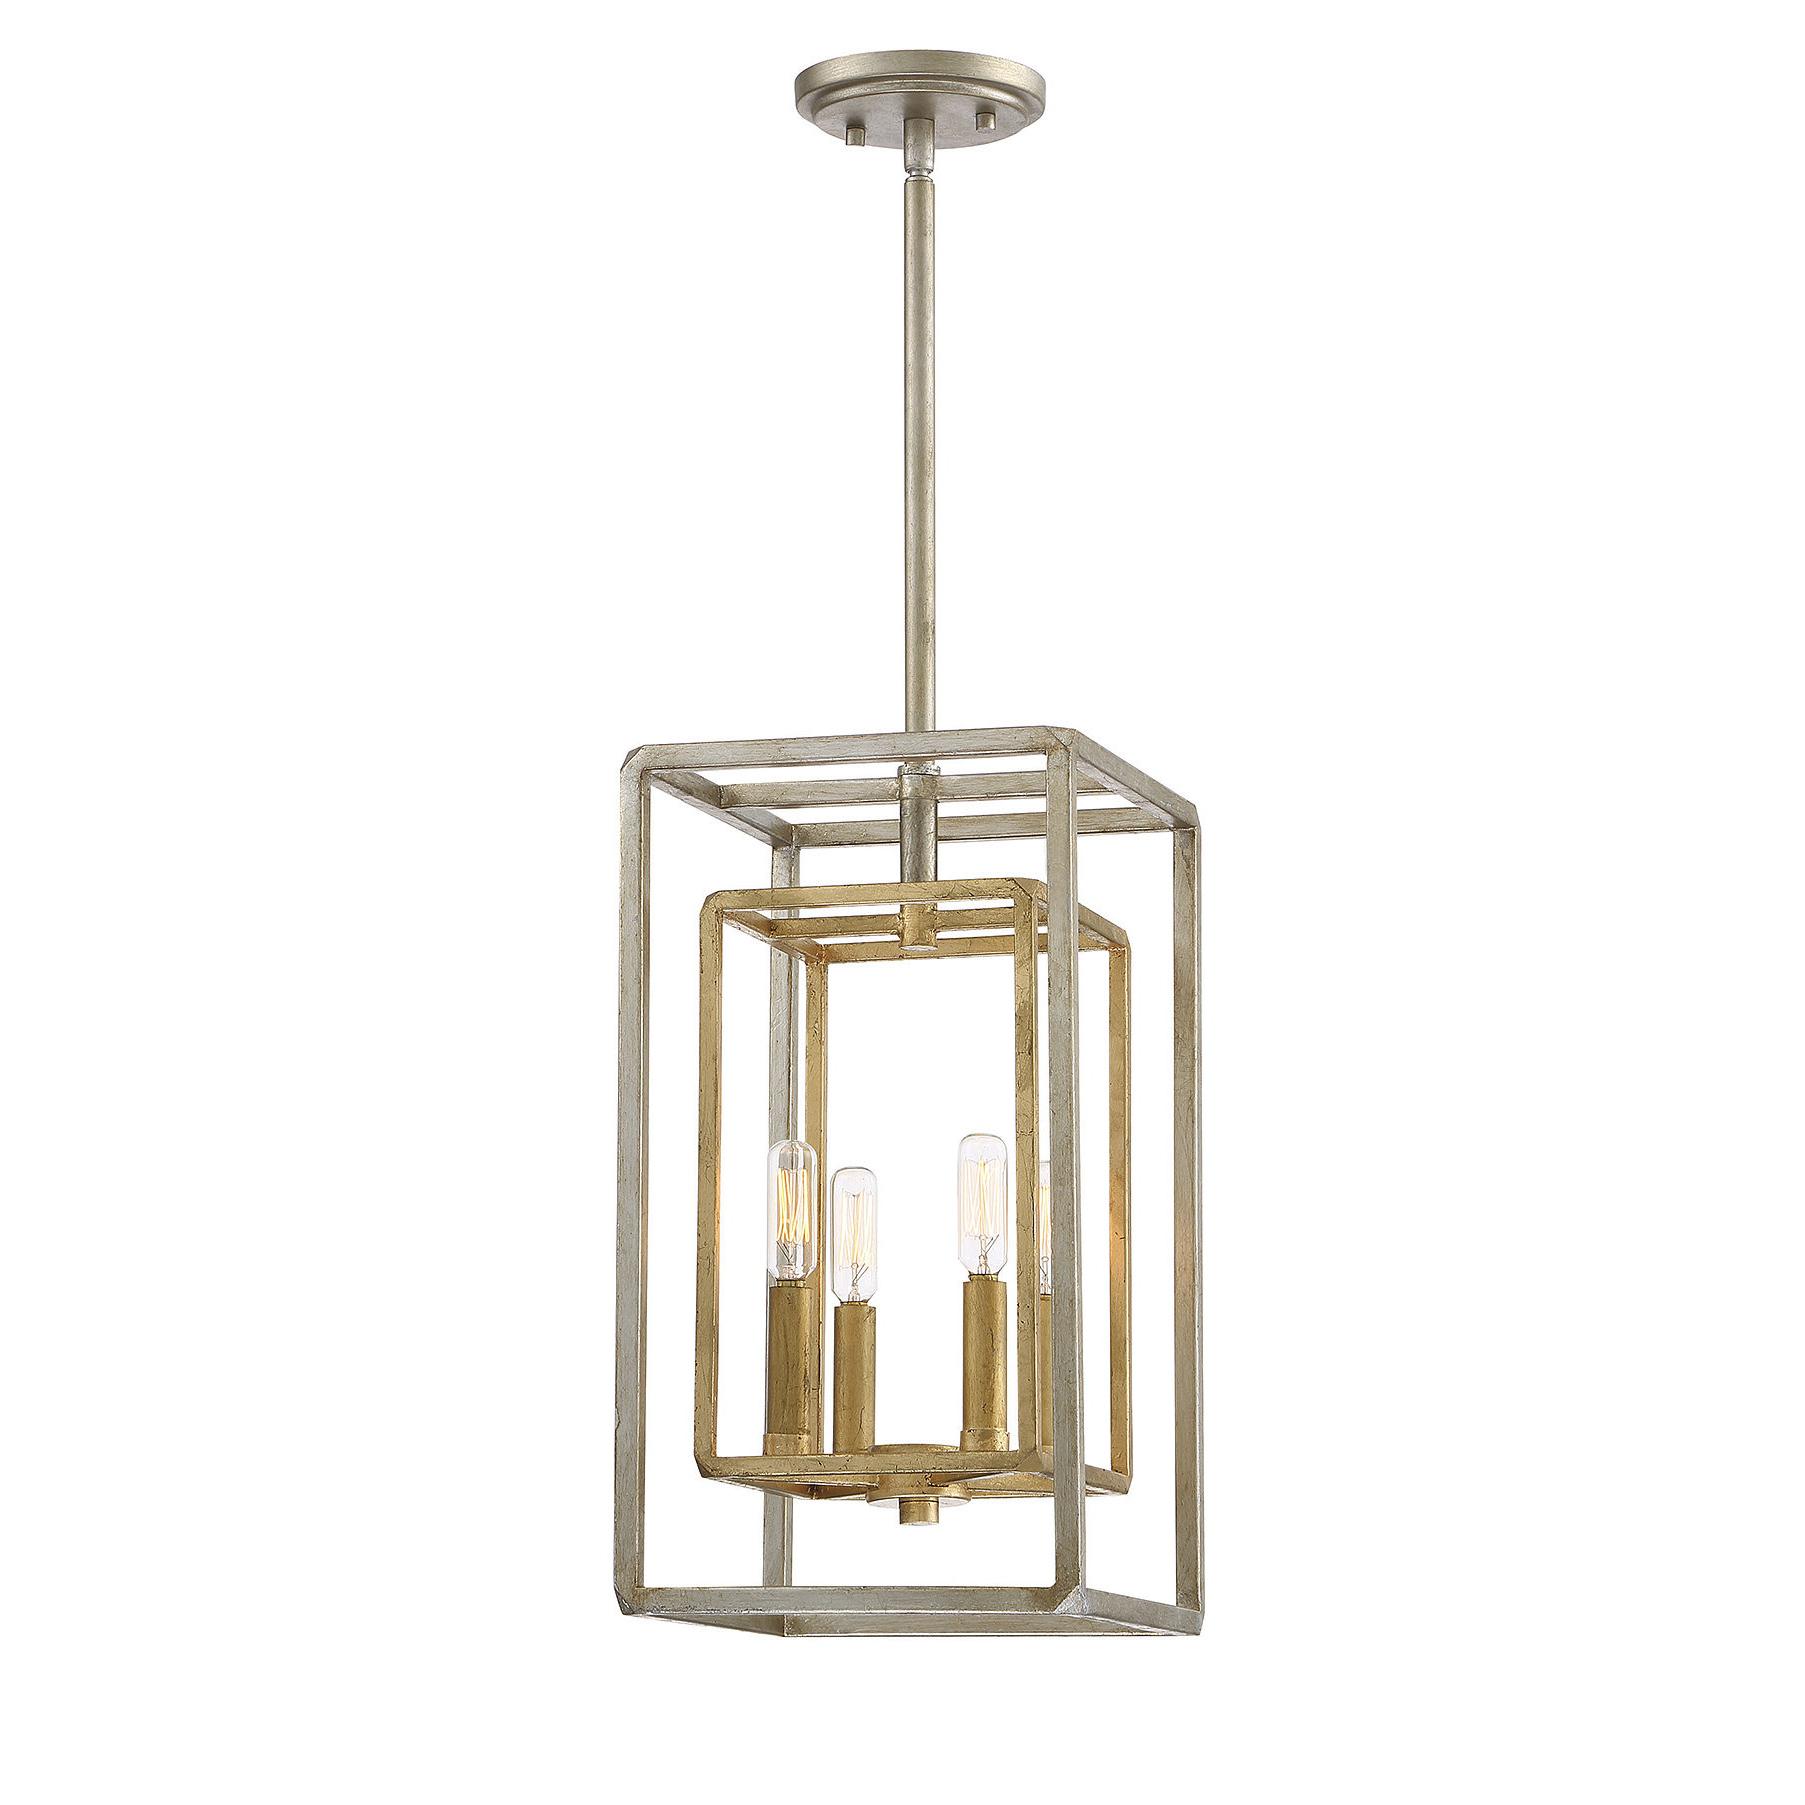 Sherri Ann 3 Light Lantern Square / Rectangle Pendants Inside Well Liked Eglantina 4 Light Lantern Square / Rectangle Pendant (View 13 of 25)